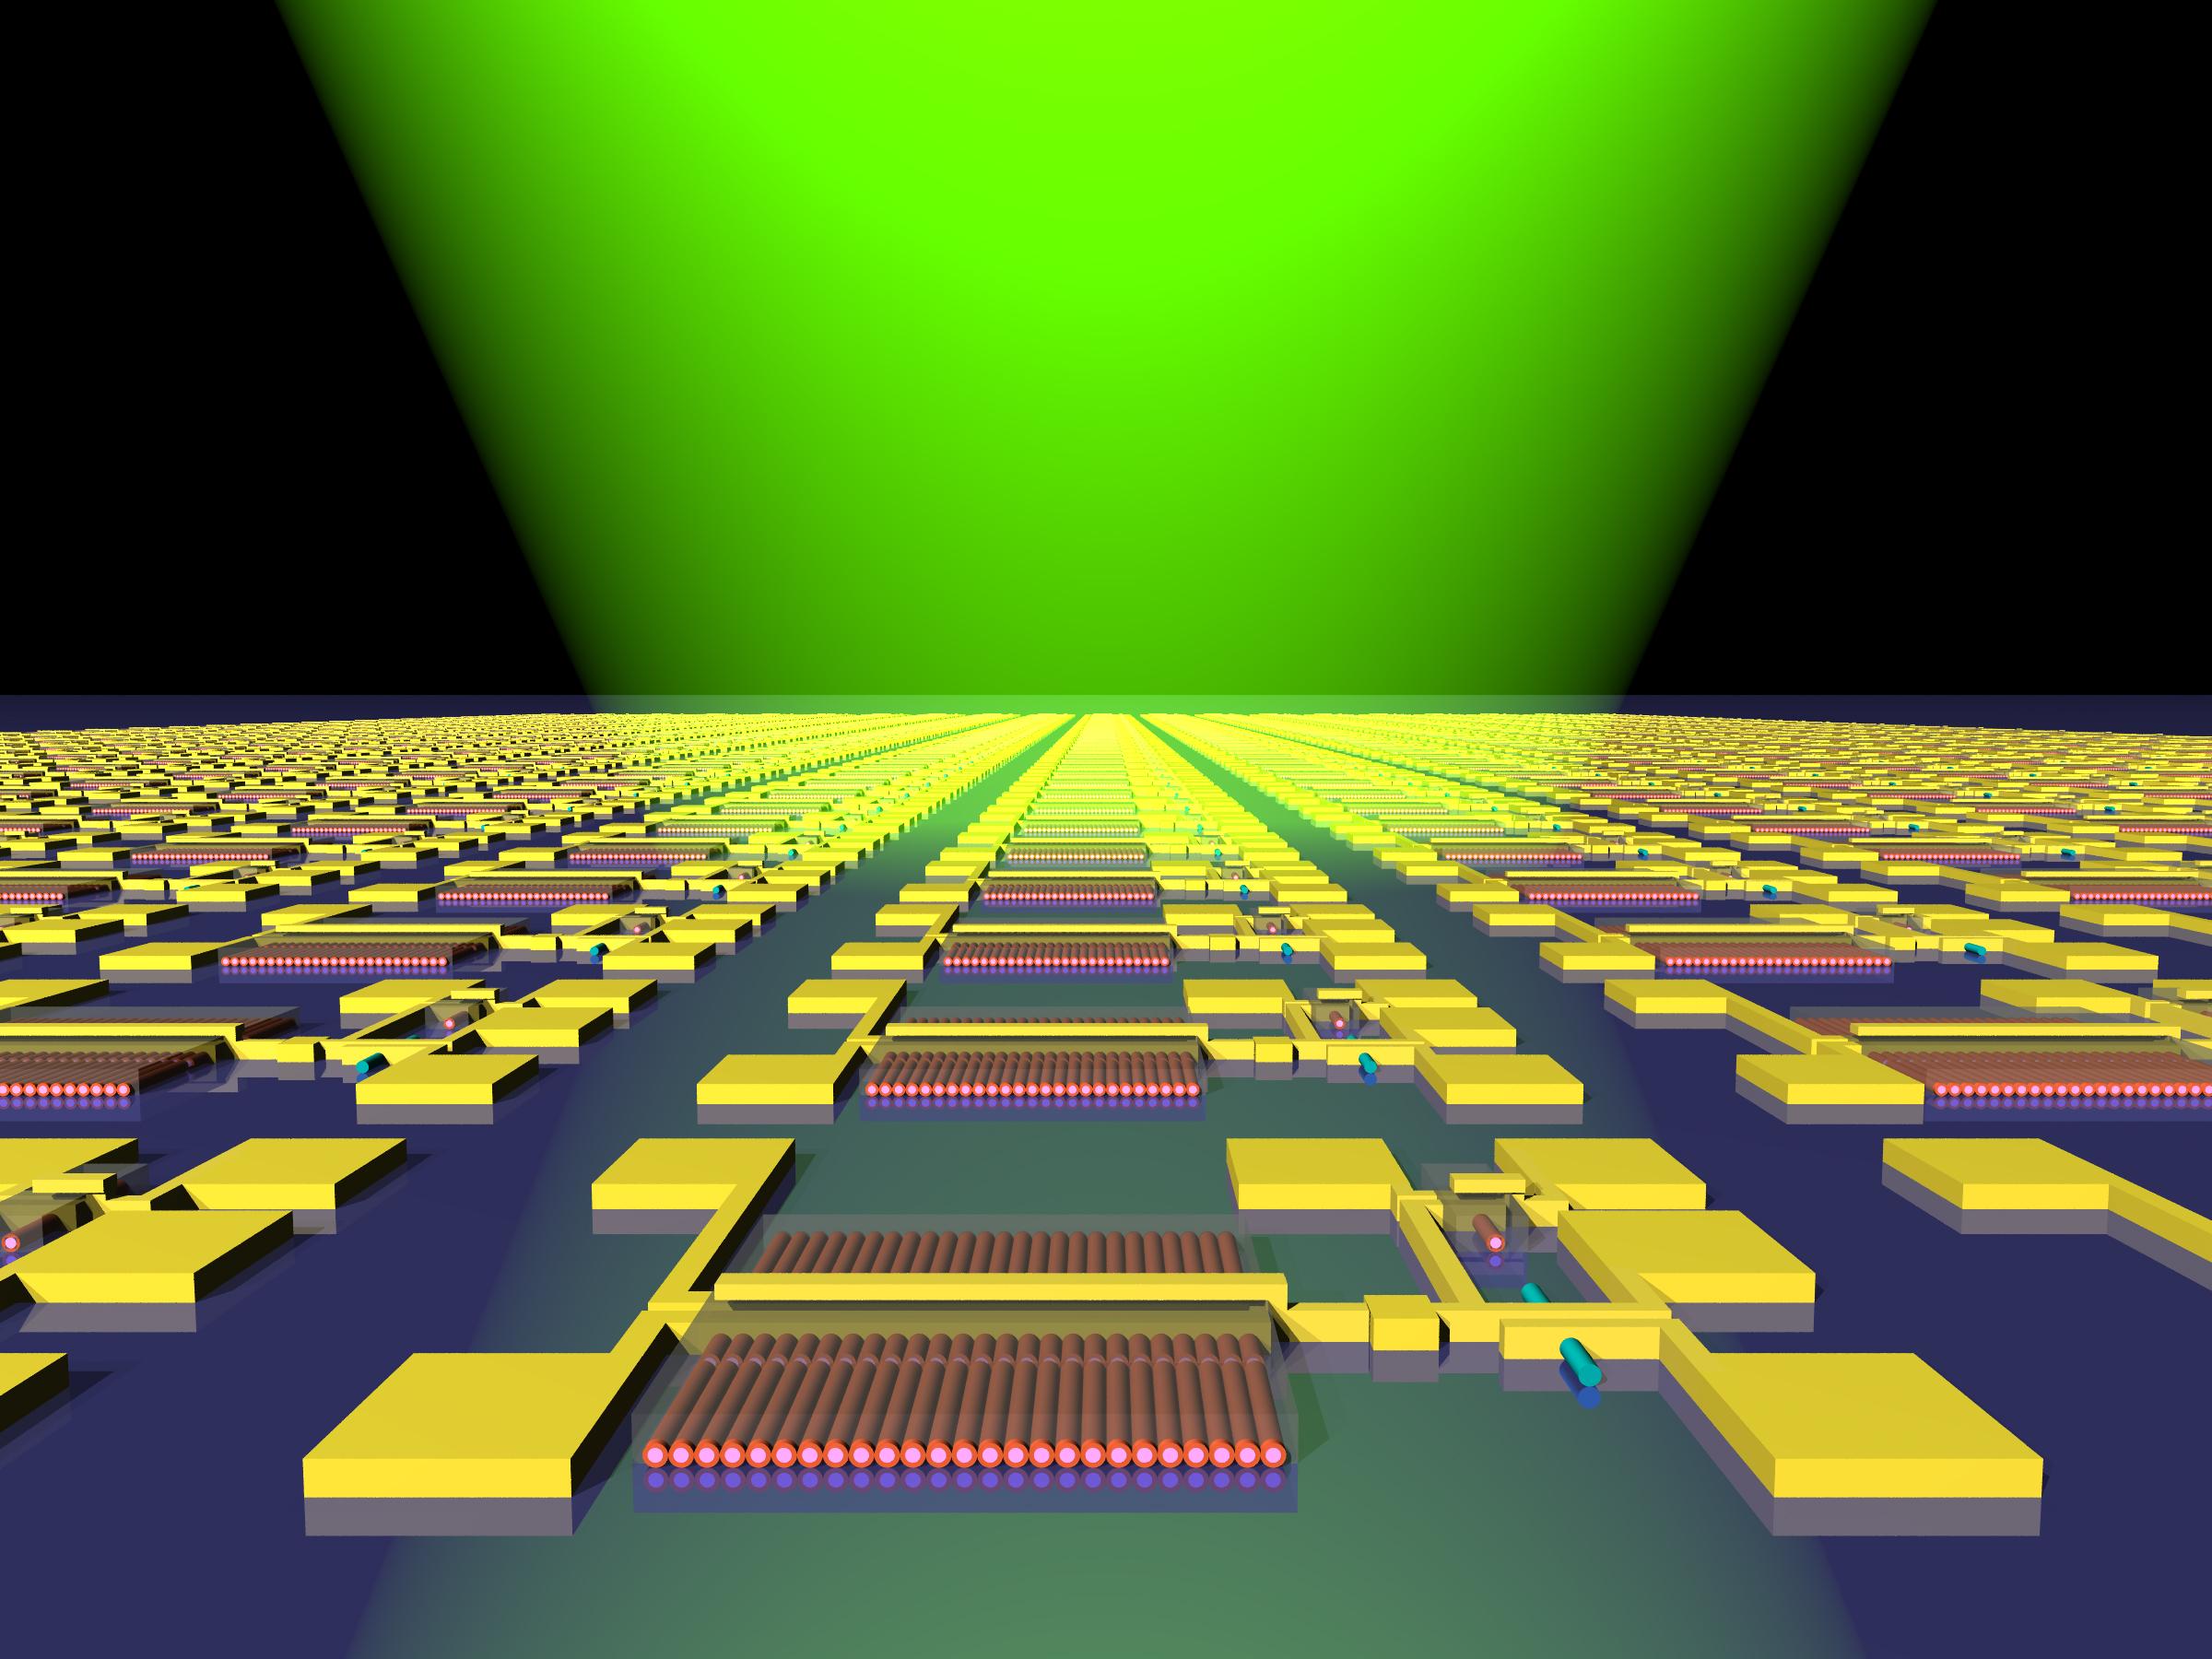 Egfi For Teachers Beat The Motion Sensor Light Wiring Diagram On Nanowire Circuit